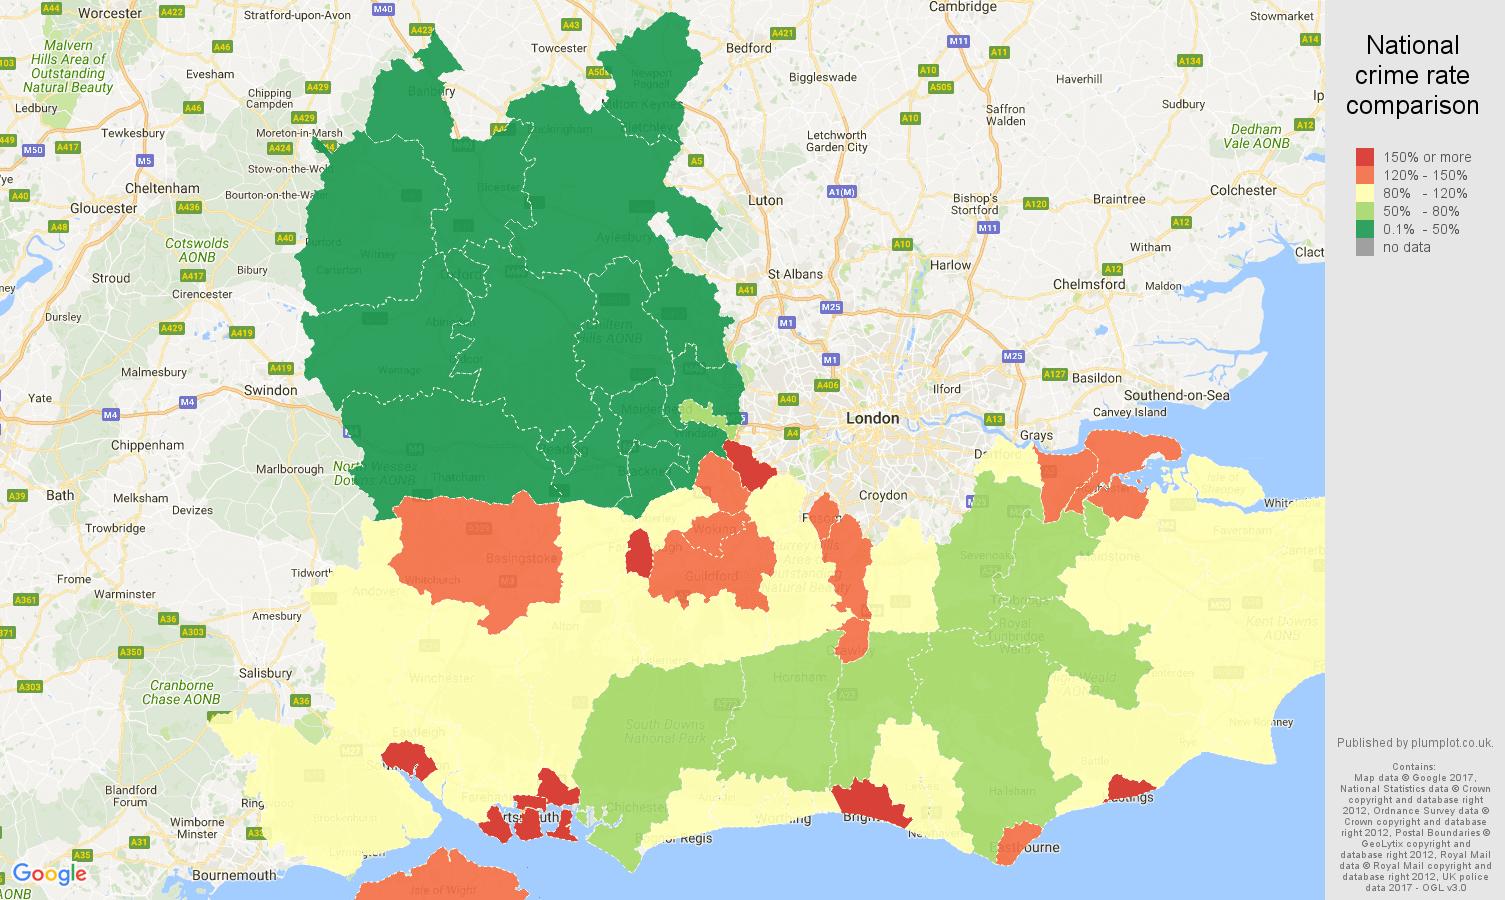 south east england public order crime rate comparison map